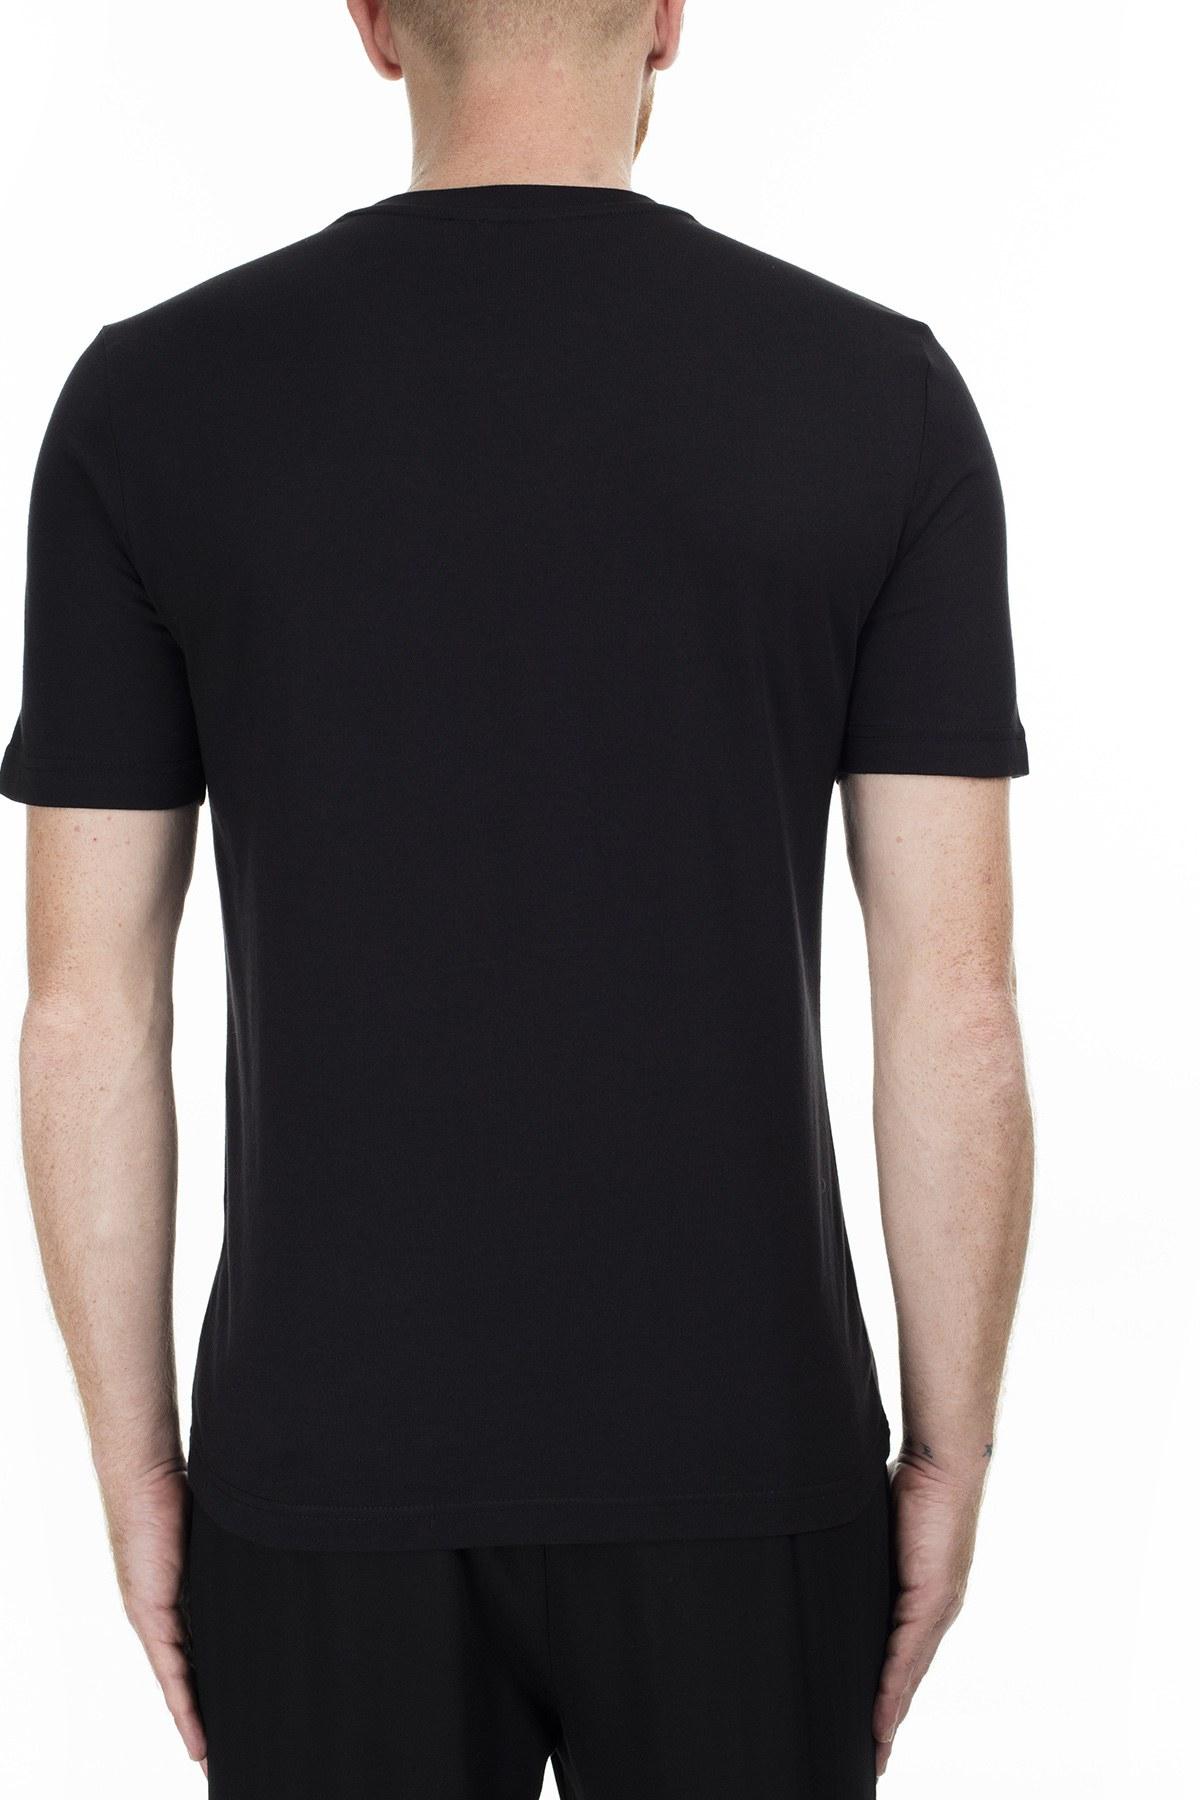 Love Moschino Erkek T Shirt S M47323BM3876 C74 SİYAH